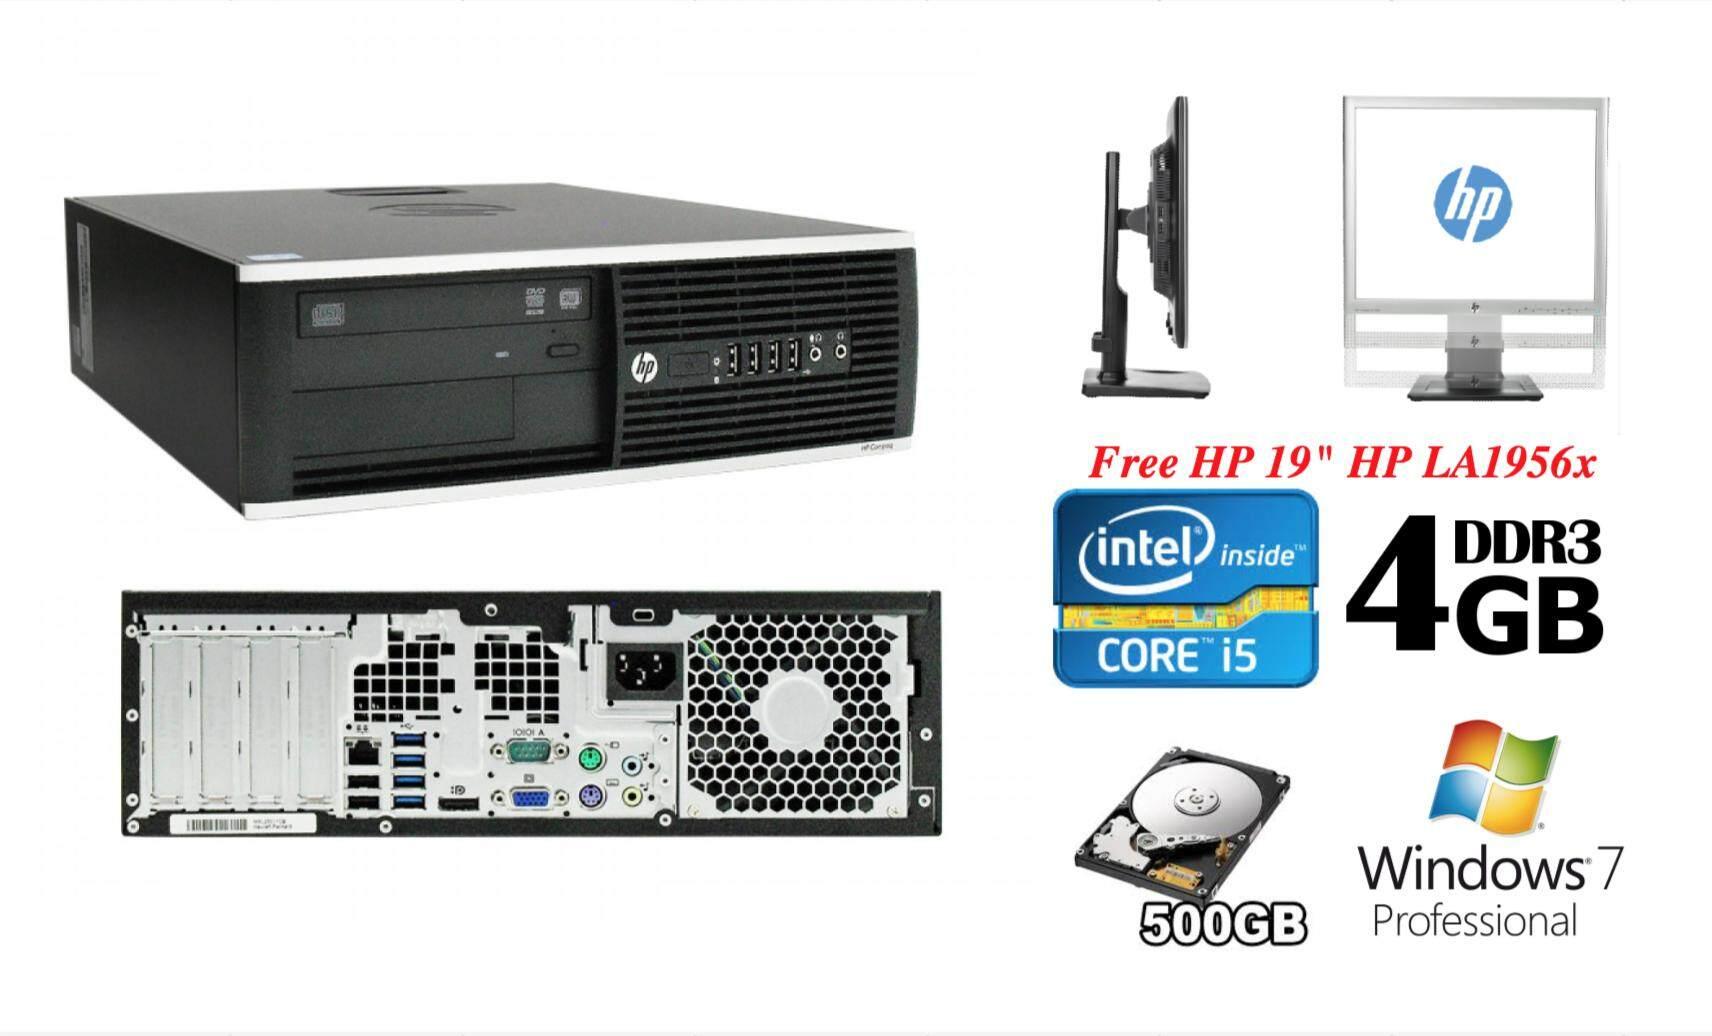 HP Compaq Pro 6300 Desktop SFF with HP 19